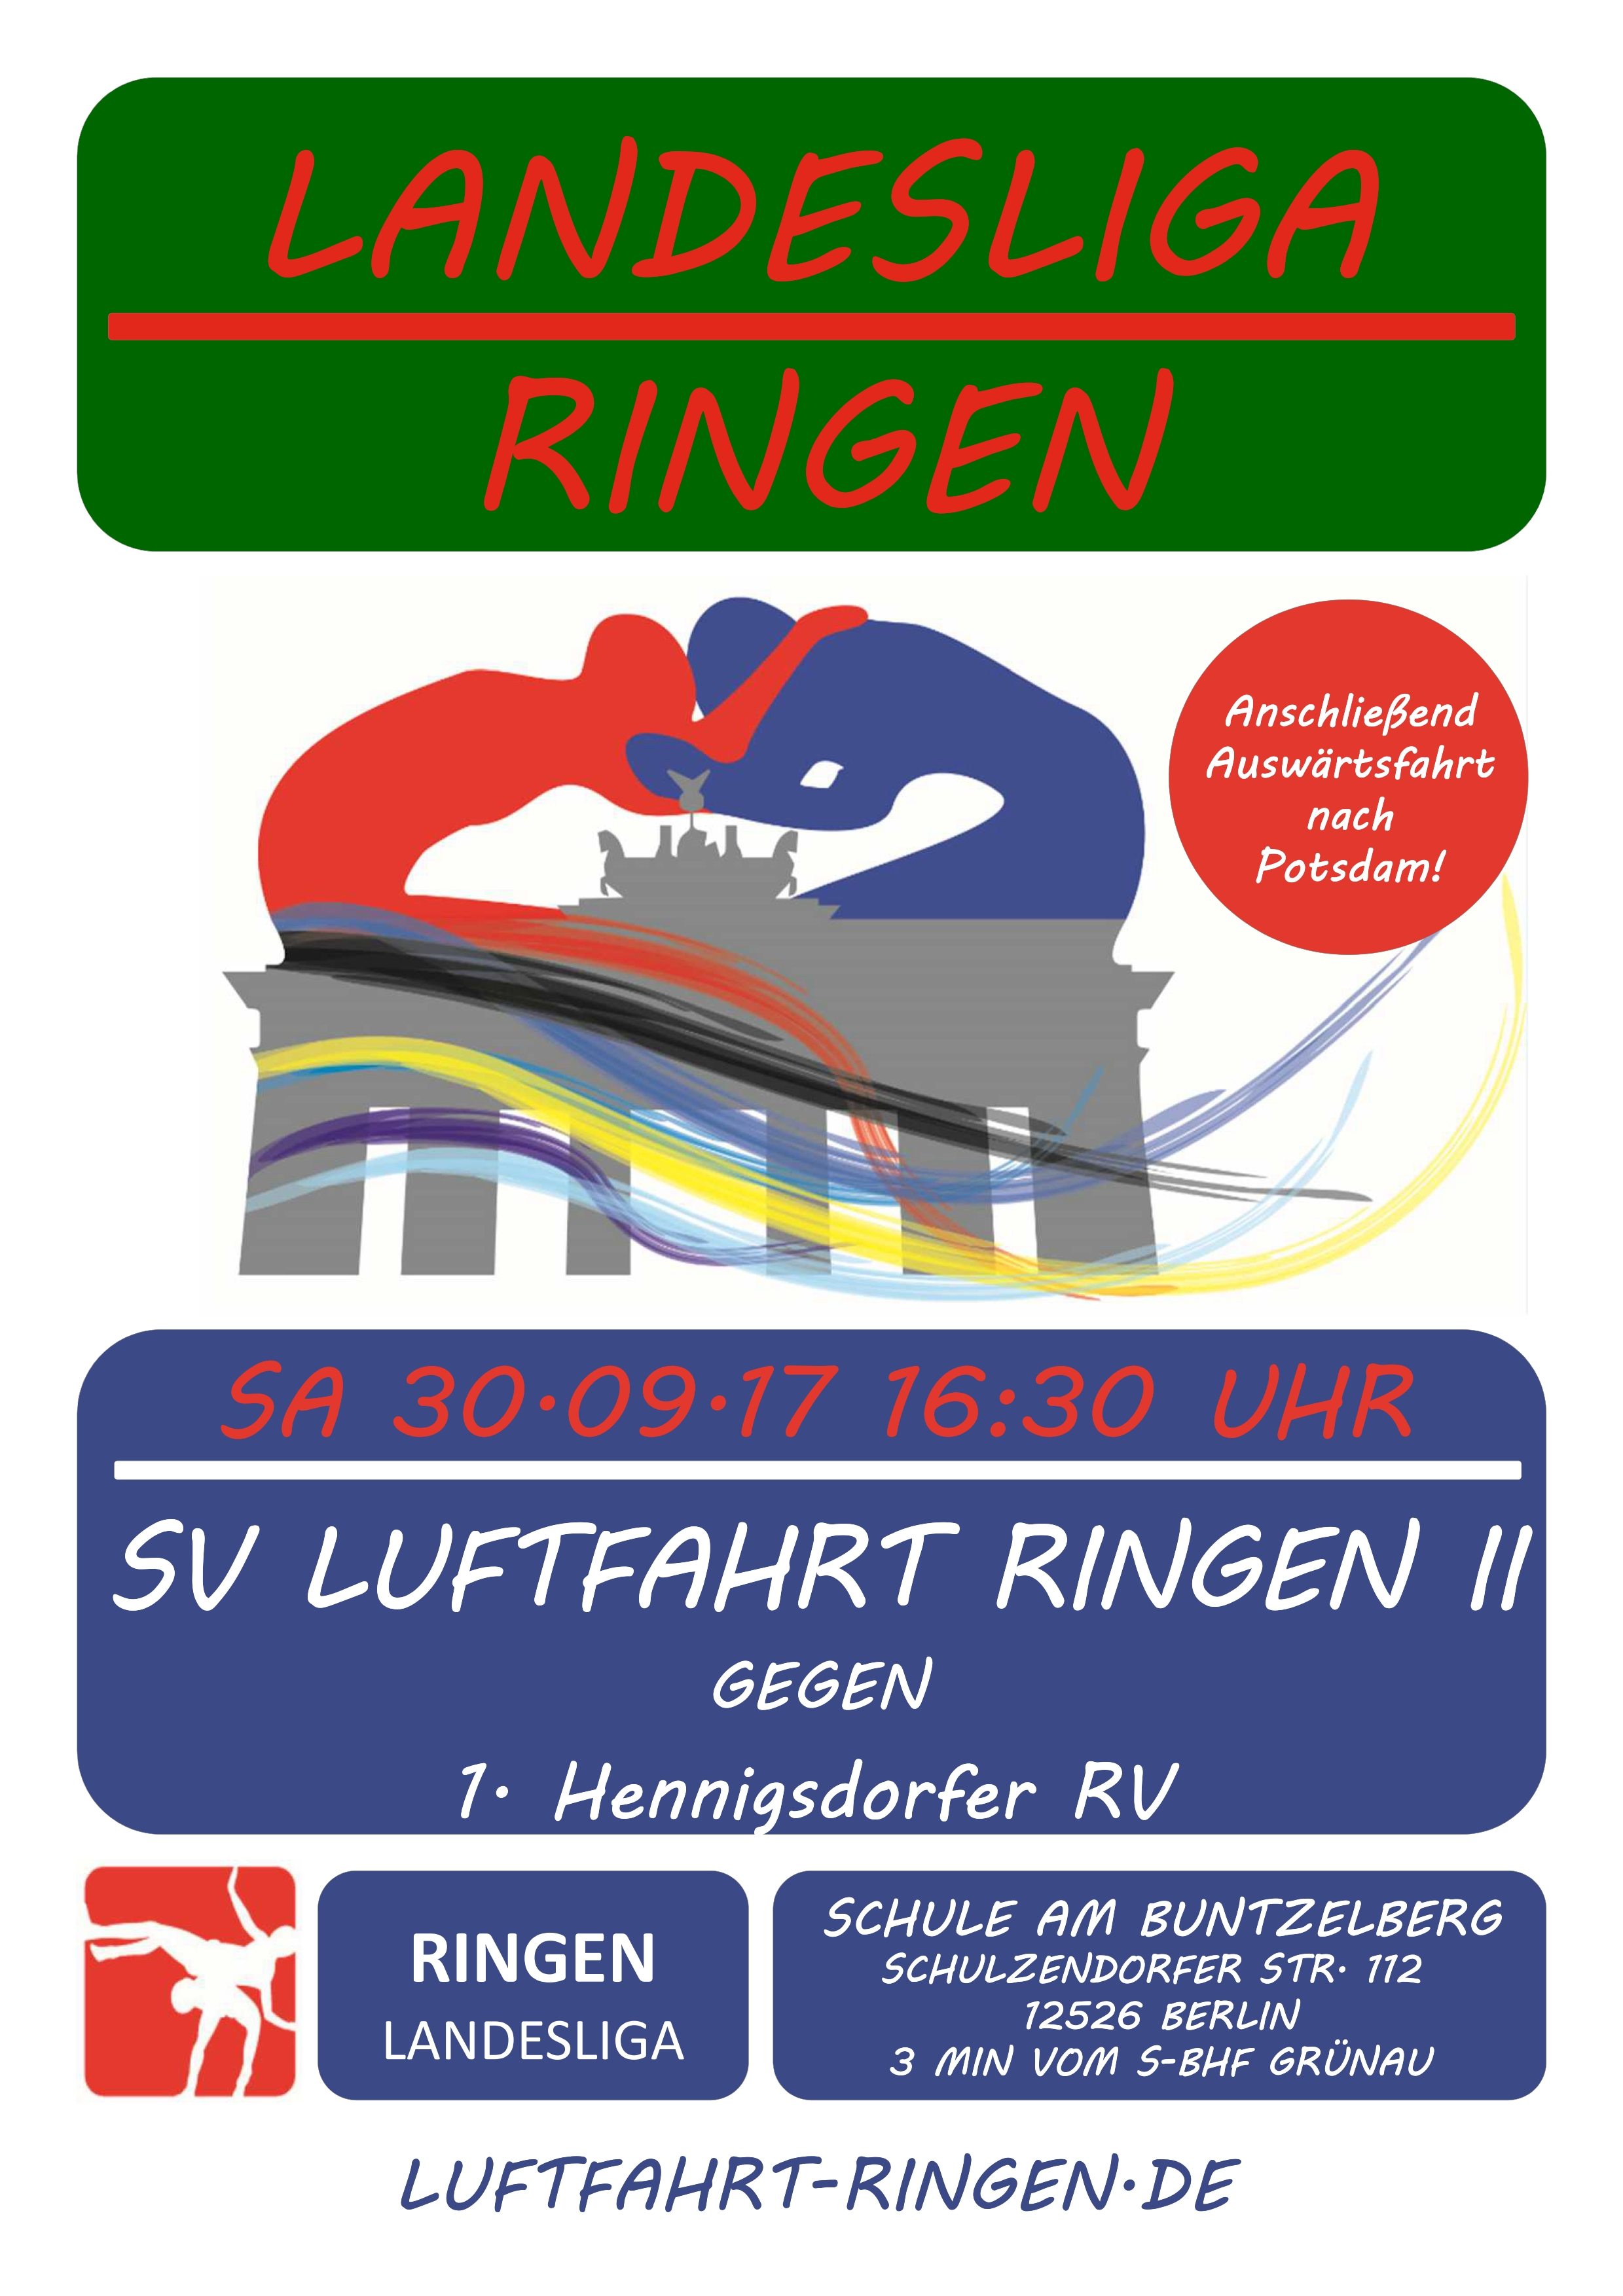 Landesliga Heimkampf gg. 1. Hennigsdorfer RV